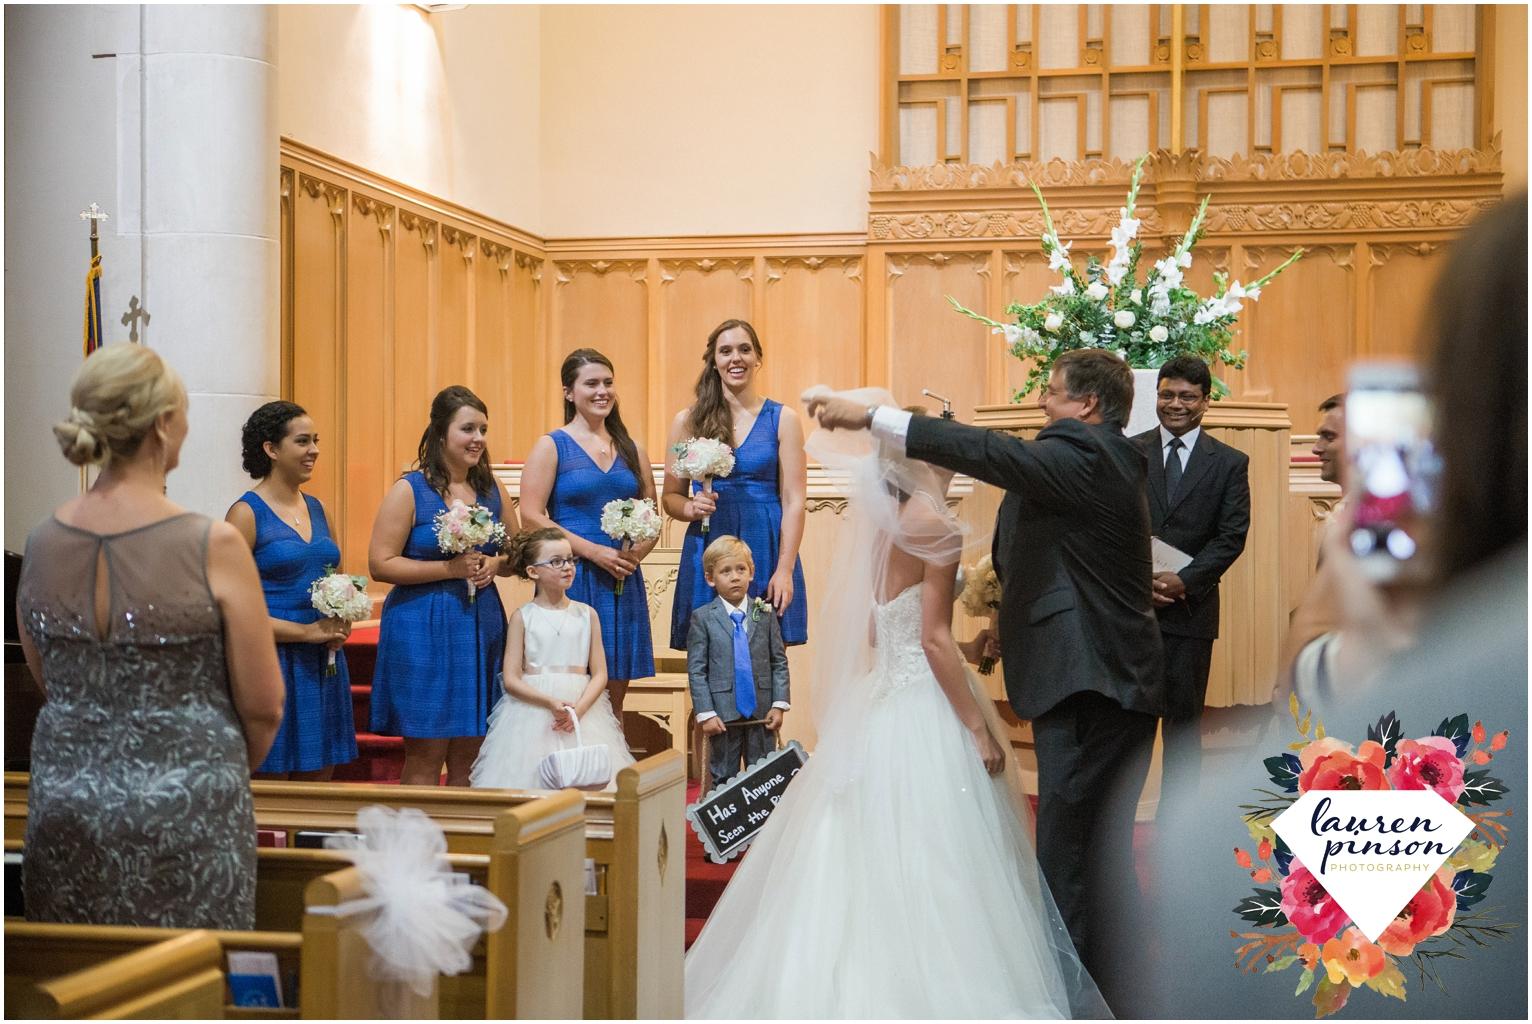 wichita-falls-wedding-photography-at-fain-presbyterian-church-and-the-wellington-timeless-classic-modern-photographer_1134.jpg